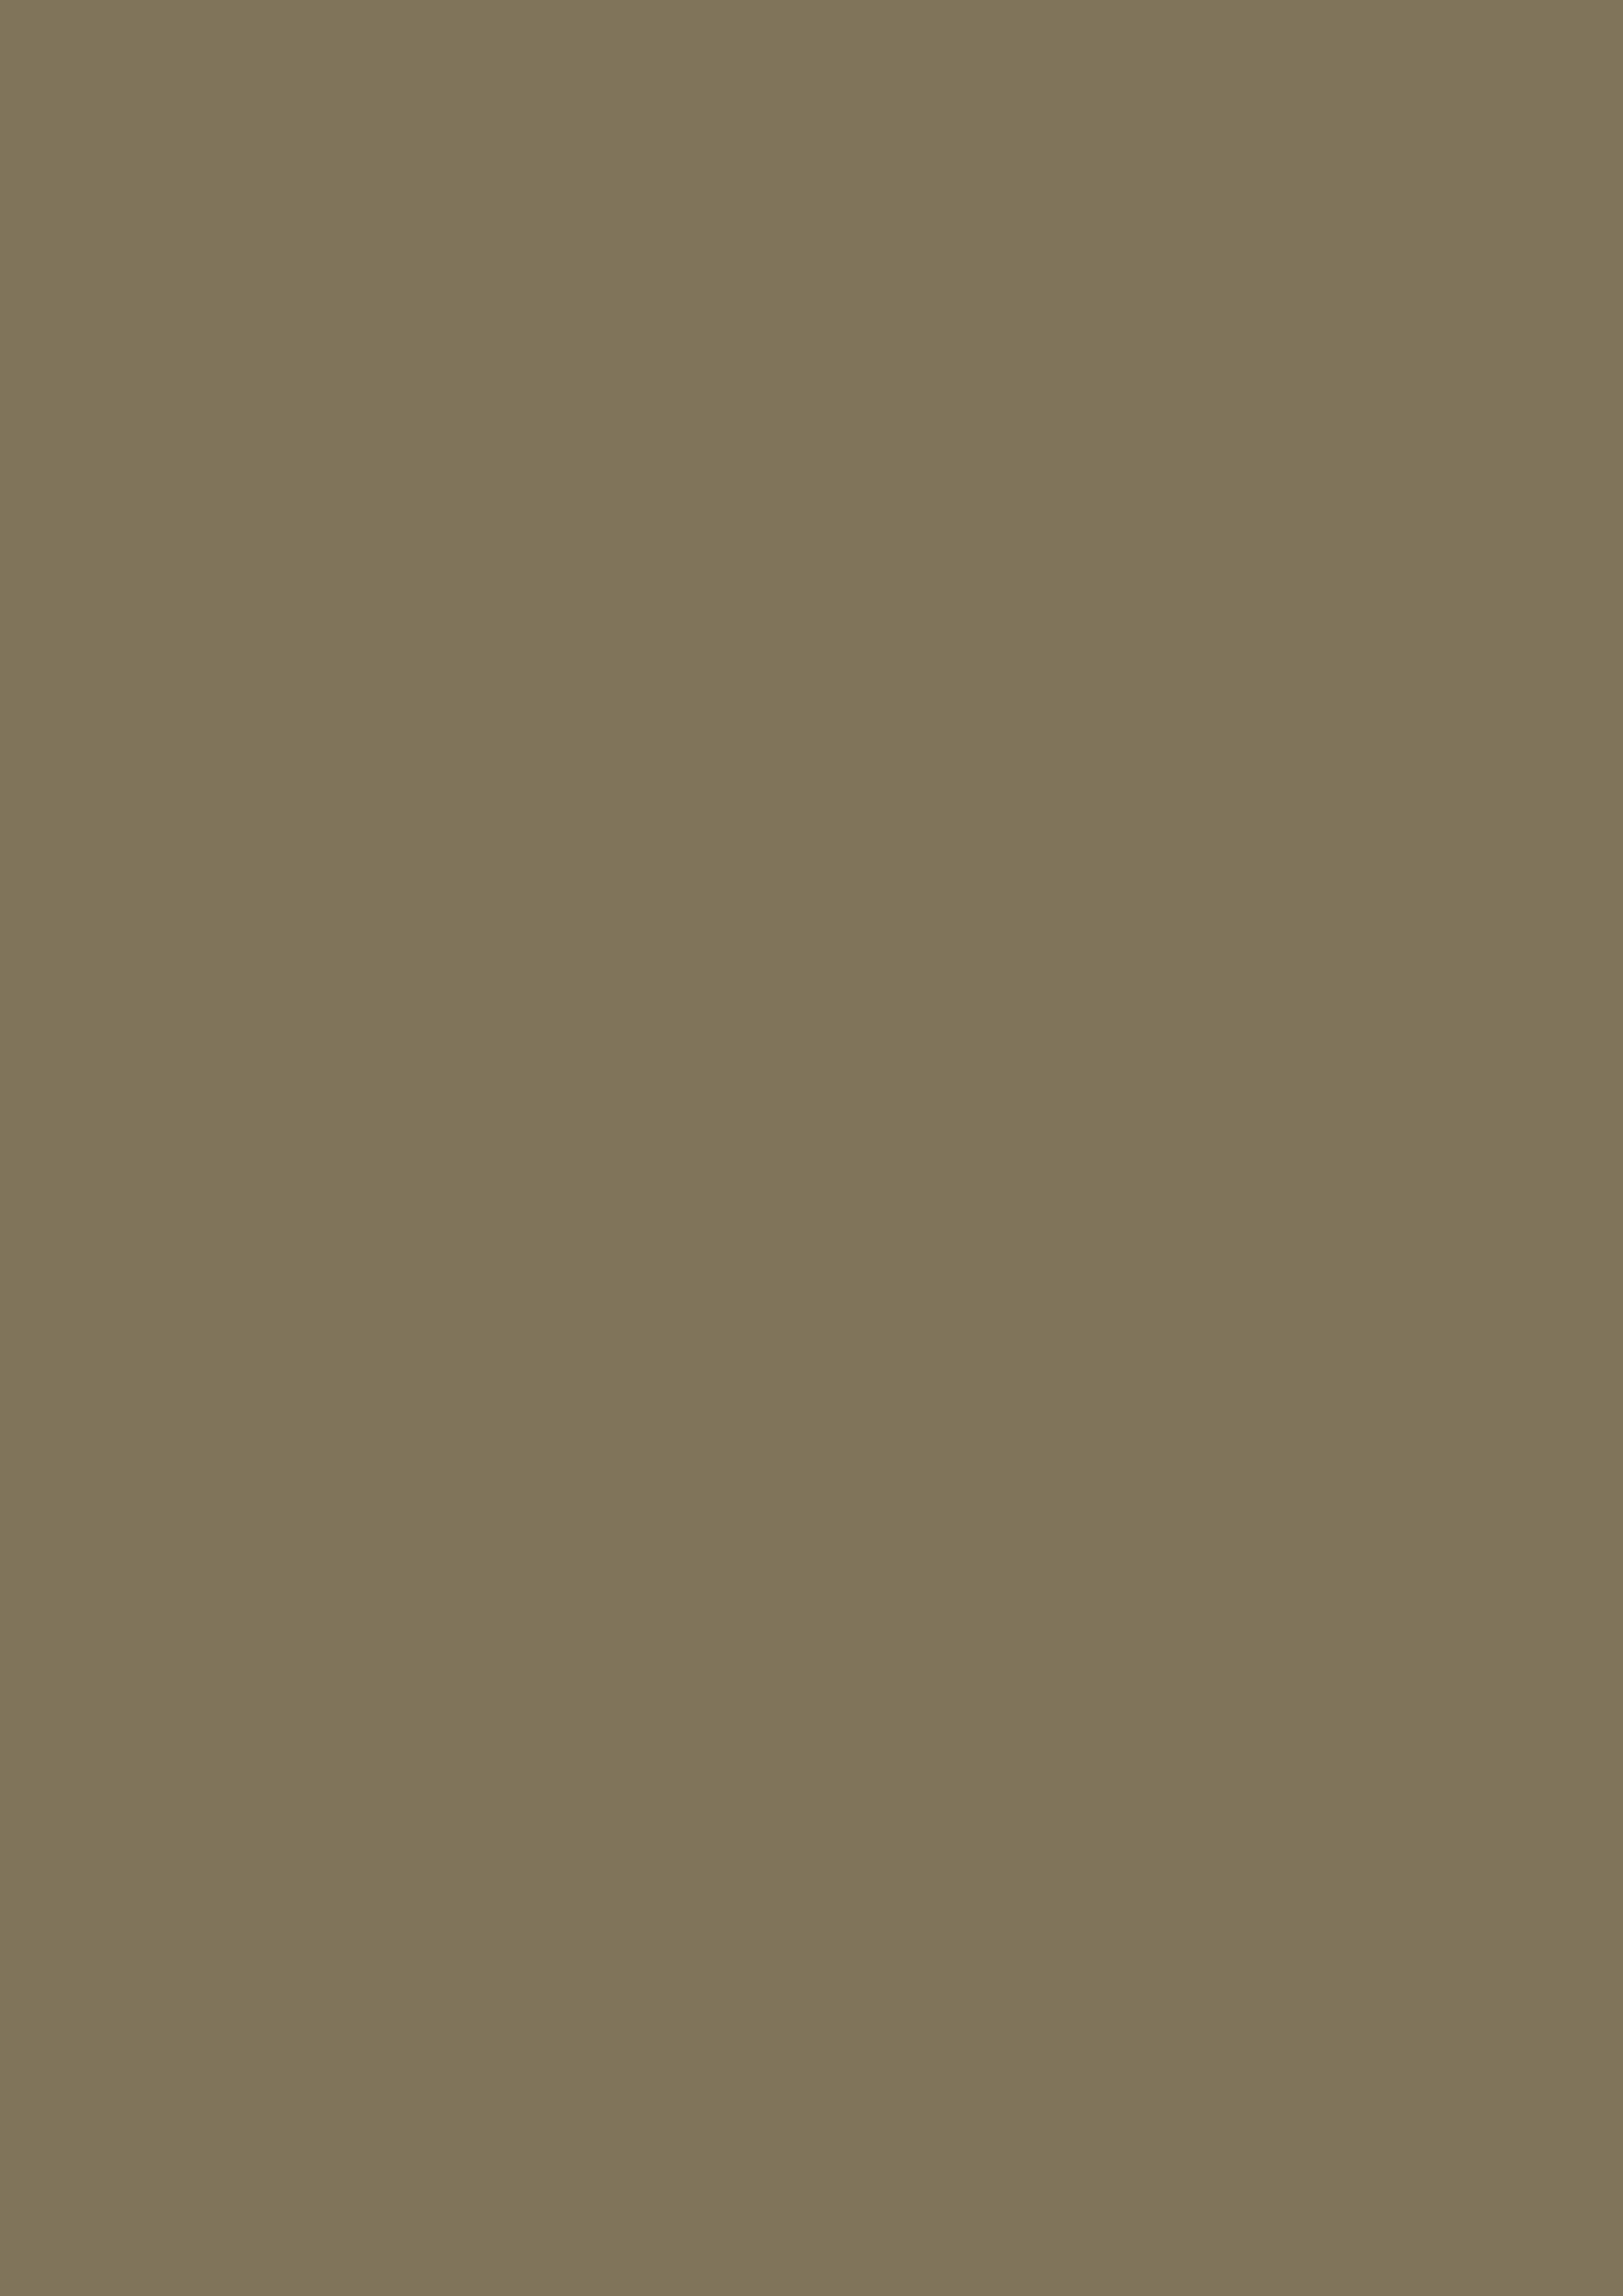 2480x3508 Spanish Bistre Solid Color Background